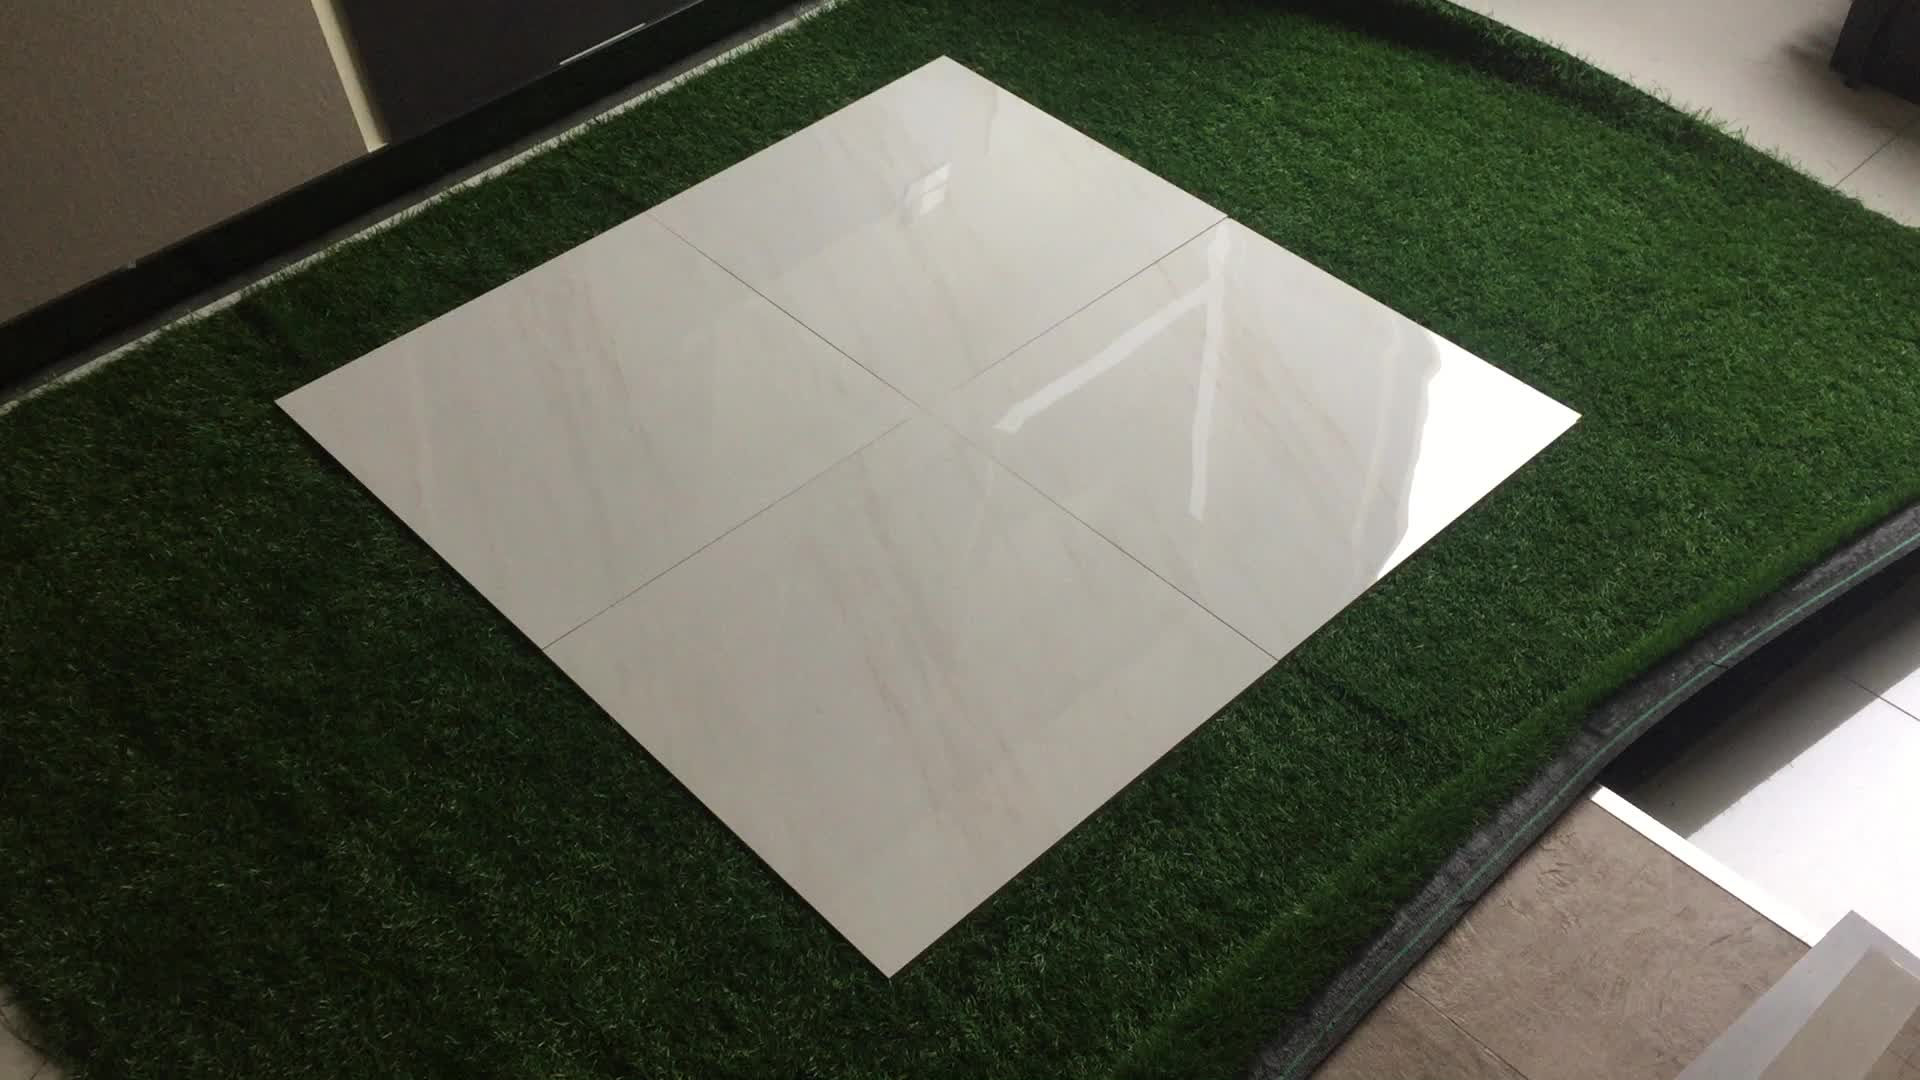 Y60151 Anti Fade Dal French Quarter Mardigras White Tiles 600x600cm